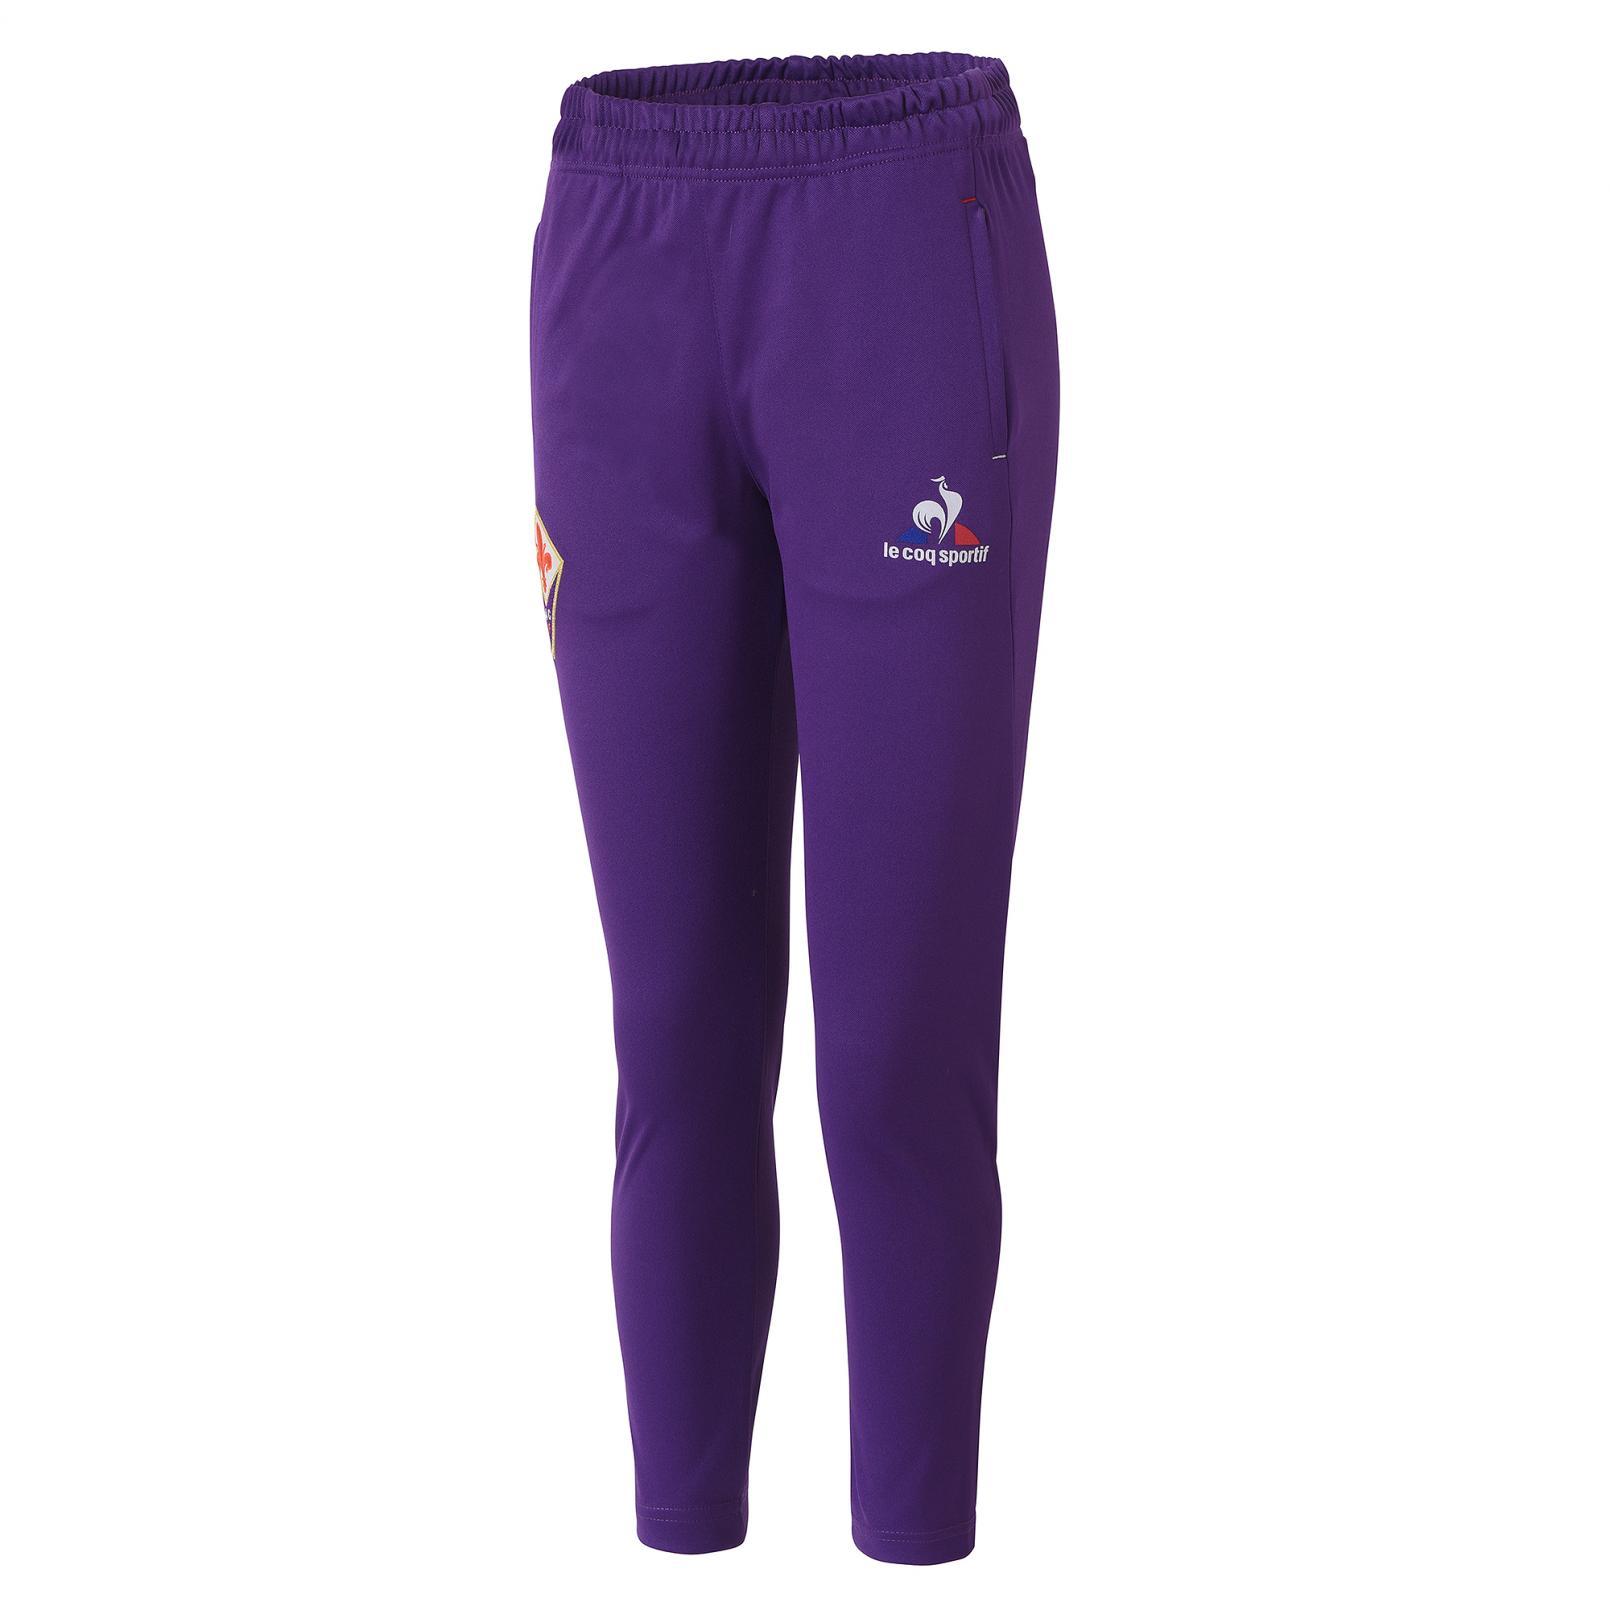 Kids Apparel – Le Coq Sportif Fiorentina Pant Purple